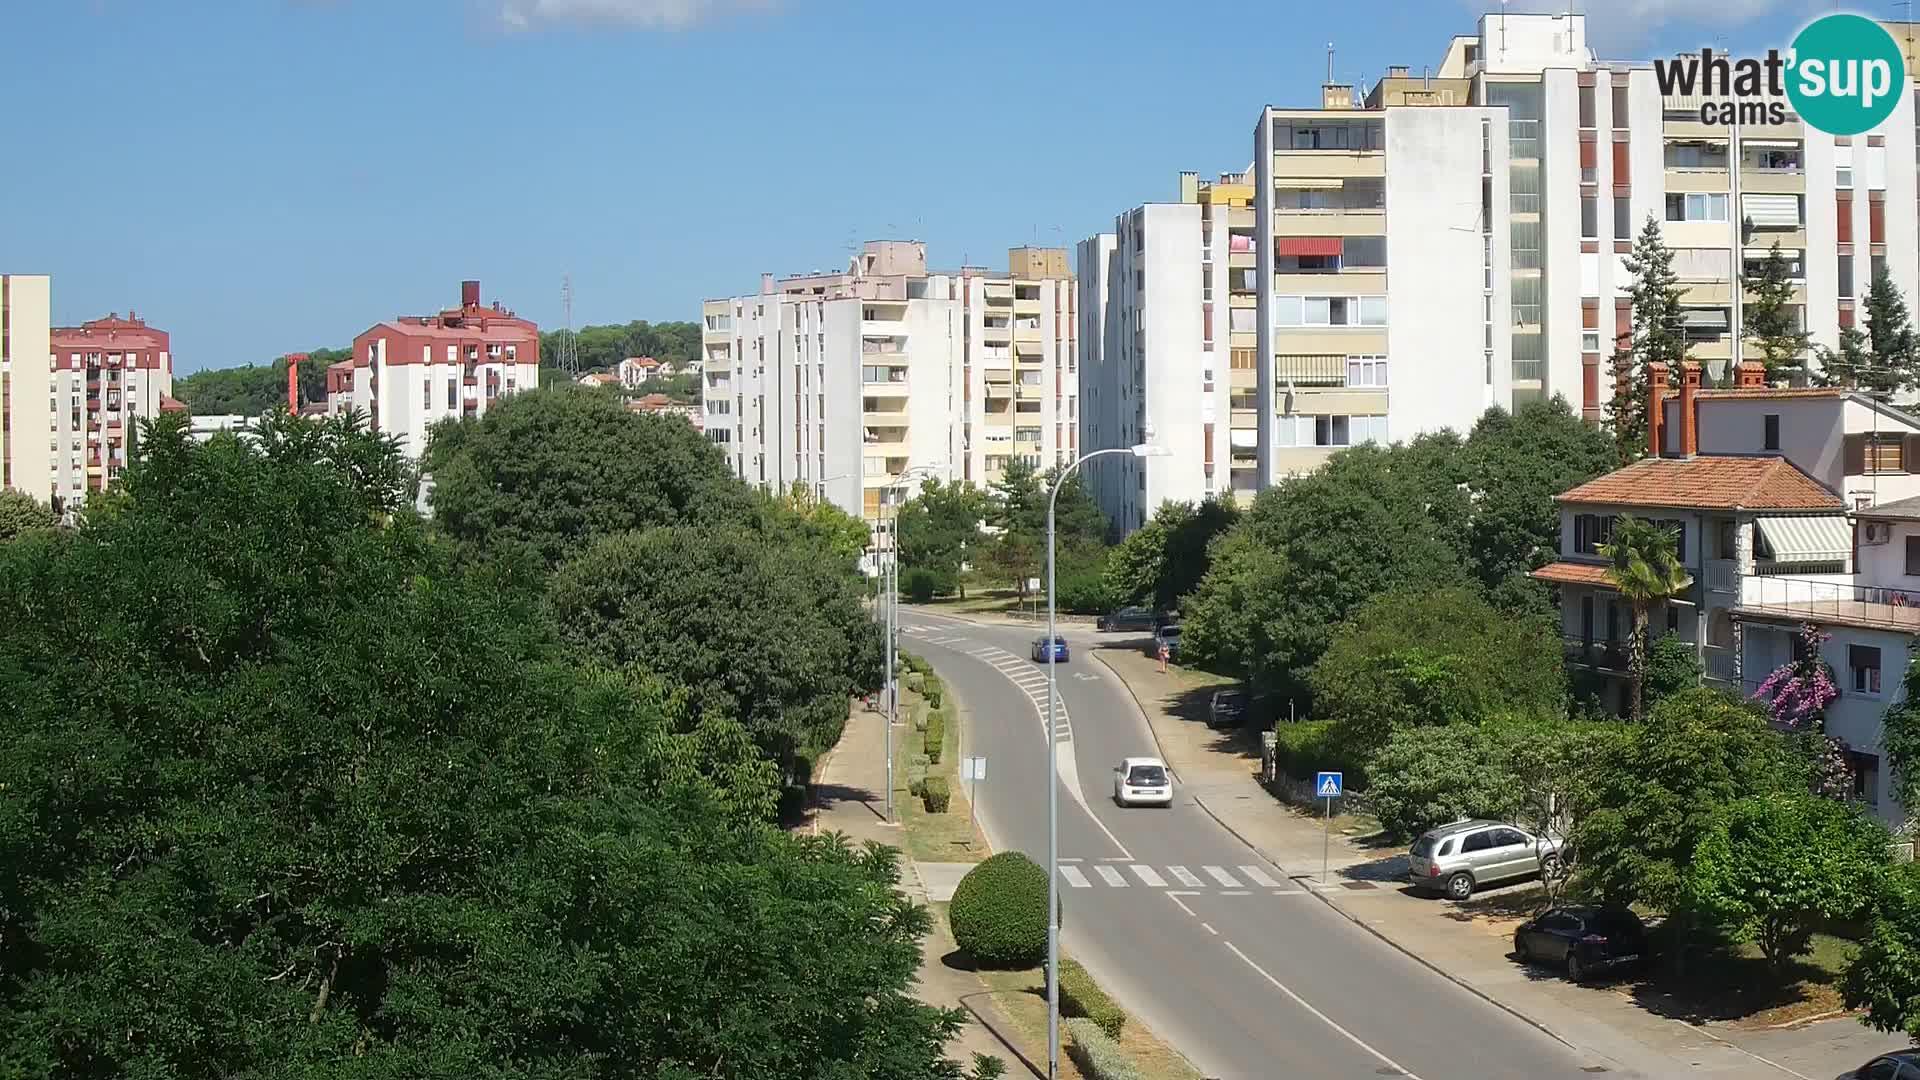 Cámara web Pula – Koper street – cámara en vivo Istria